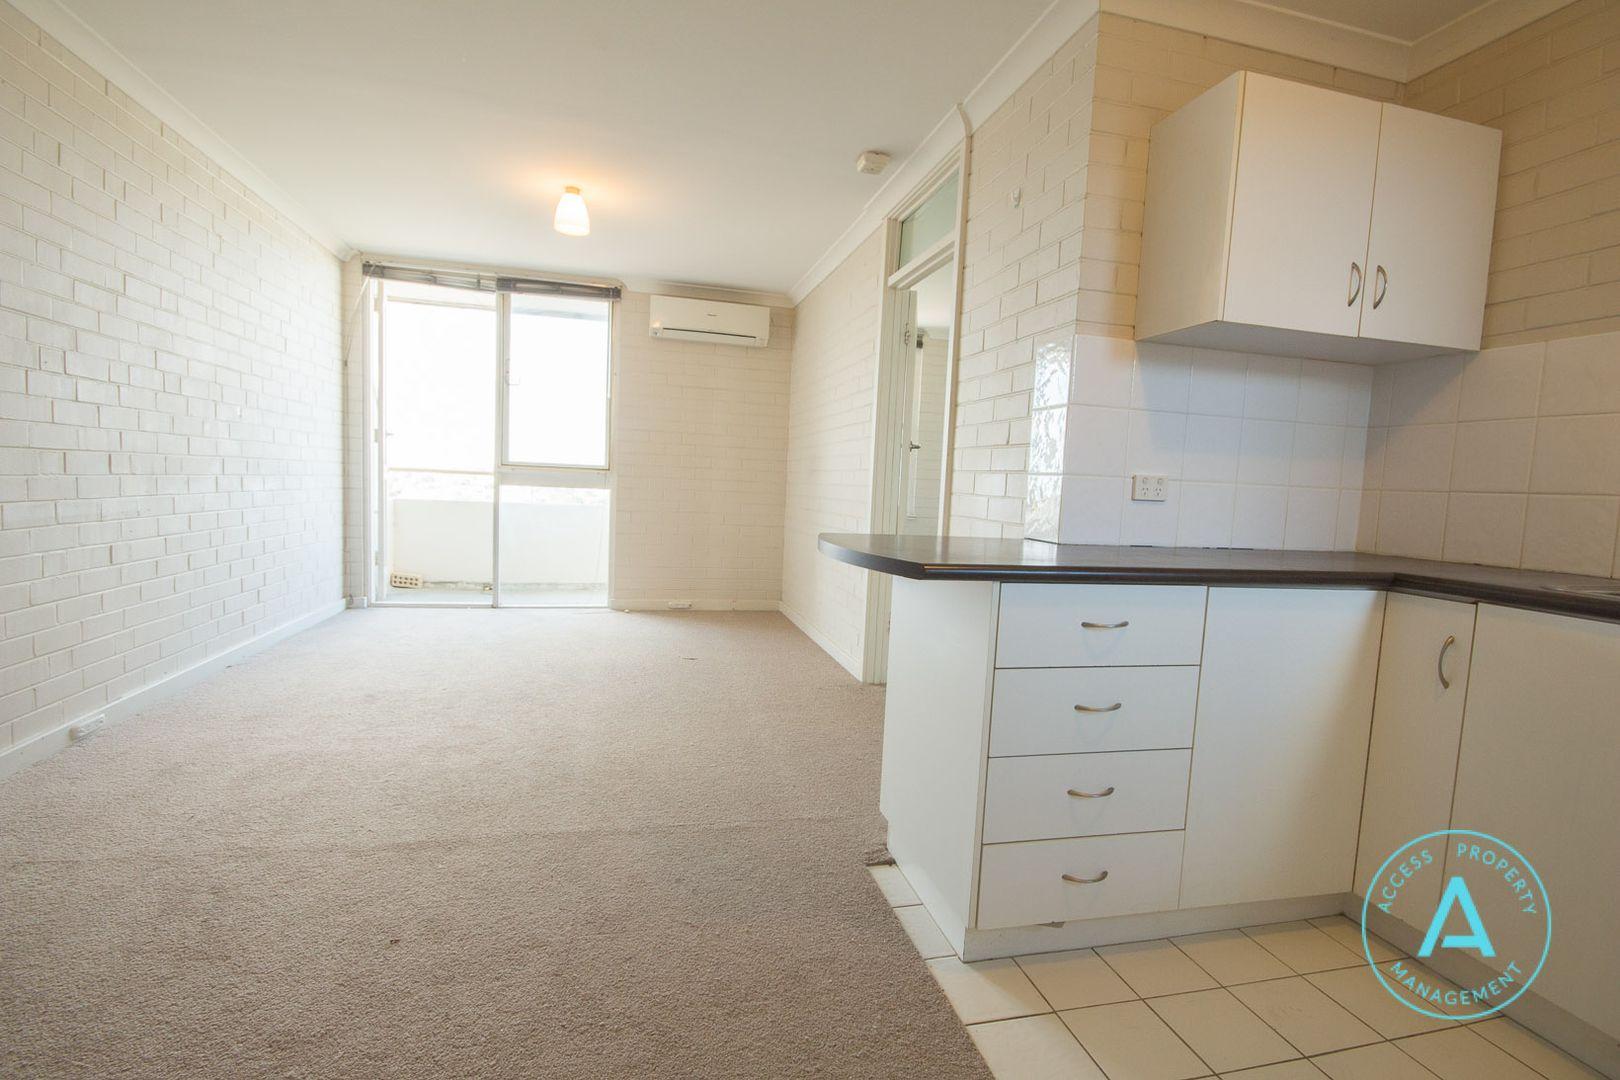 96/227 Vincent Street, West Perth WA 6005, Image 2